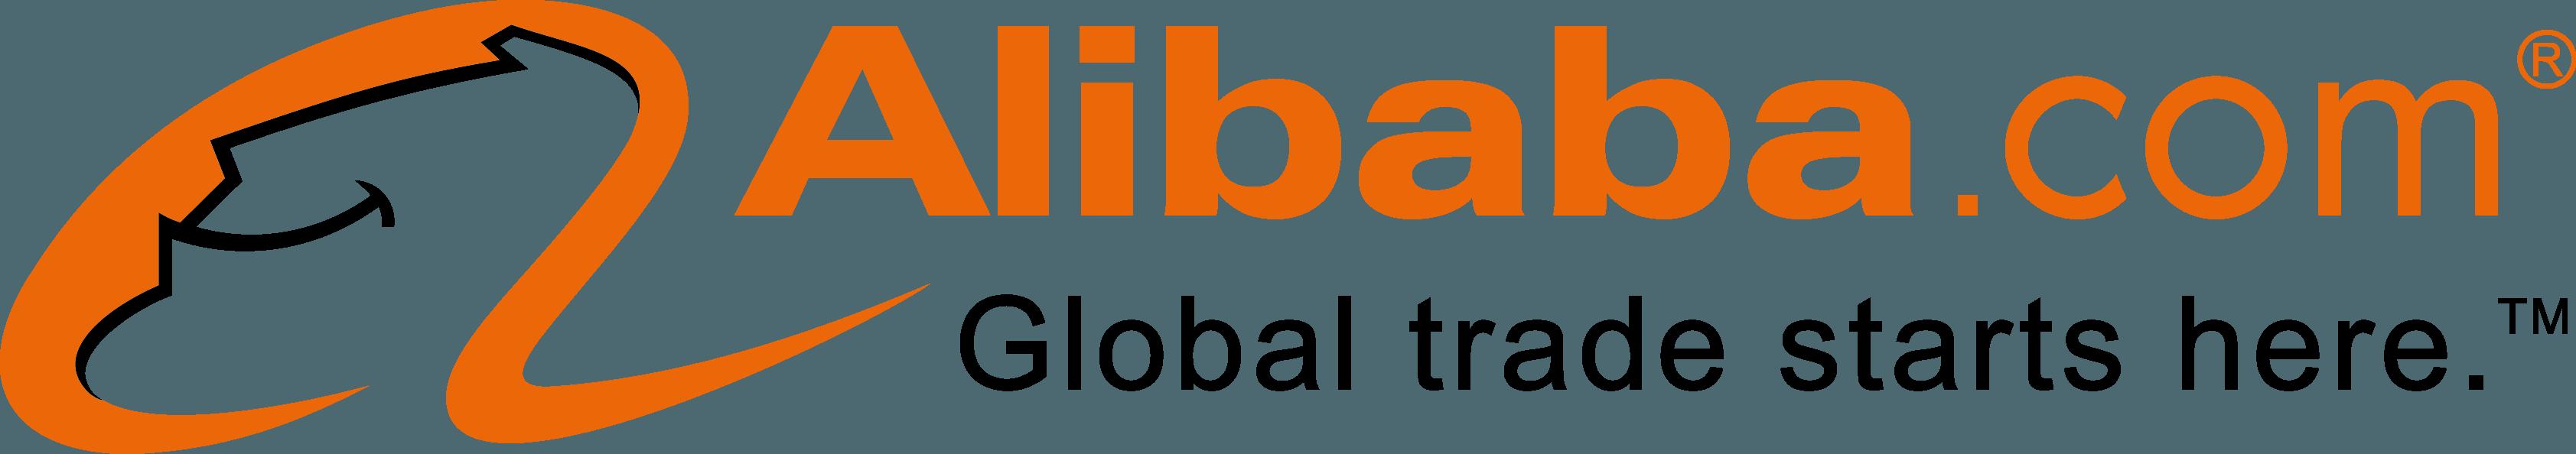 alibaba-com-logo